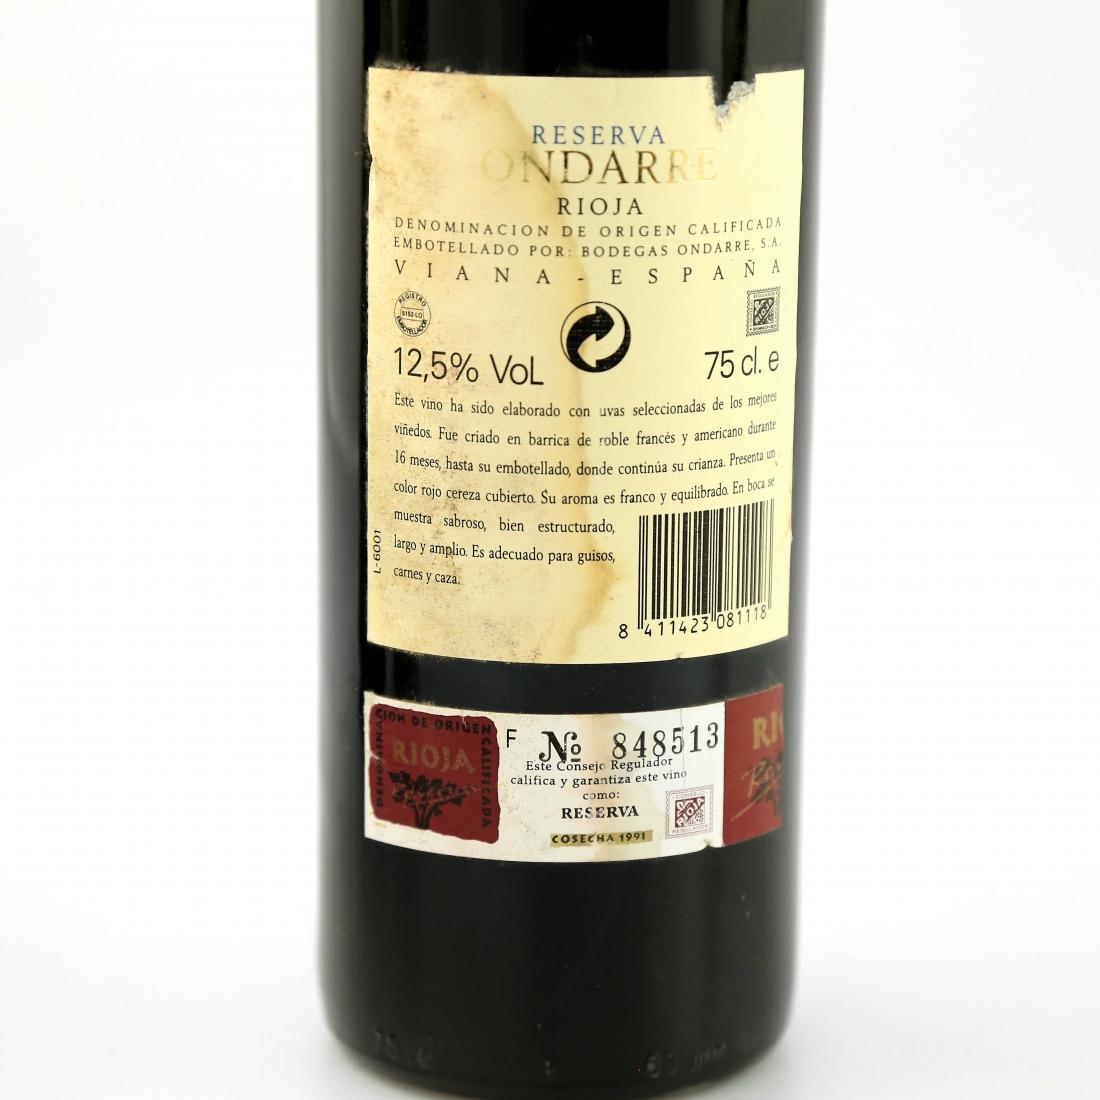 Ondarre 1991 Rioja Reserva 4x75cl